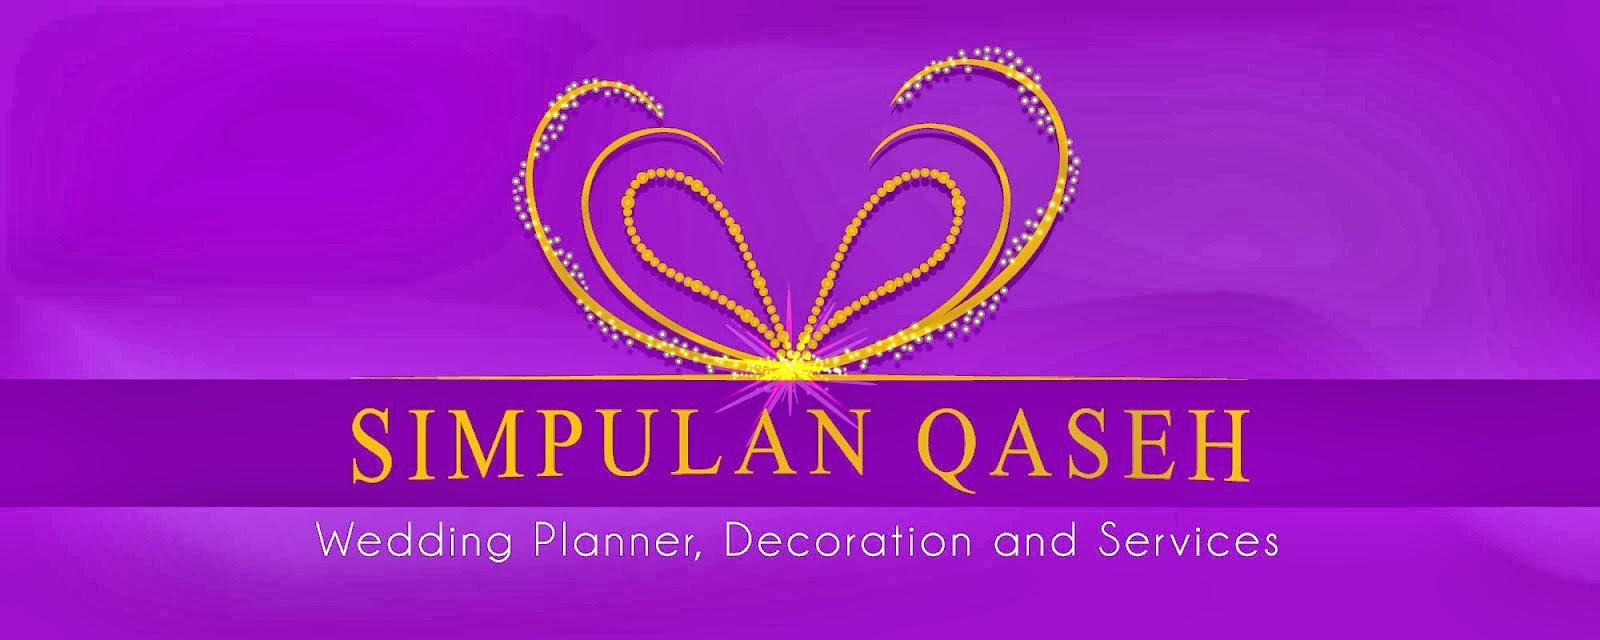 Simpulan Qaseh Wedding Planner